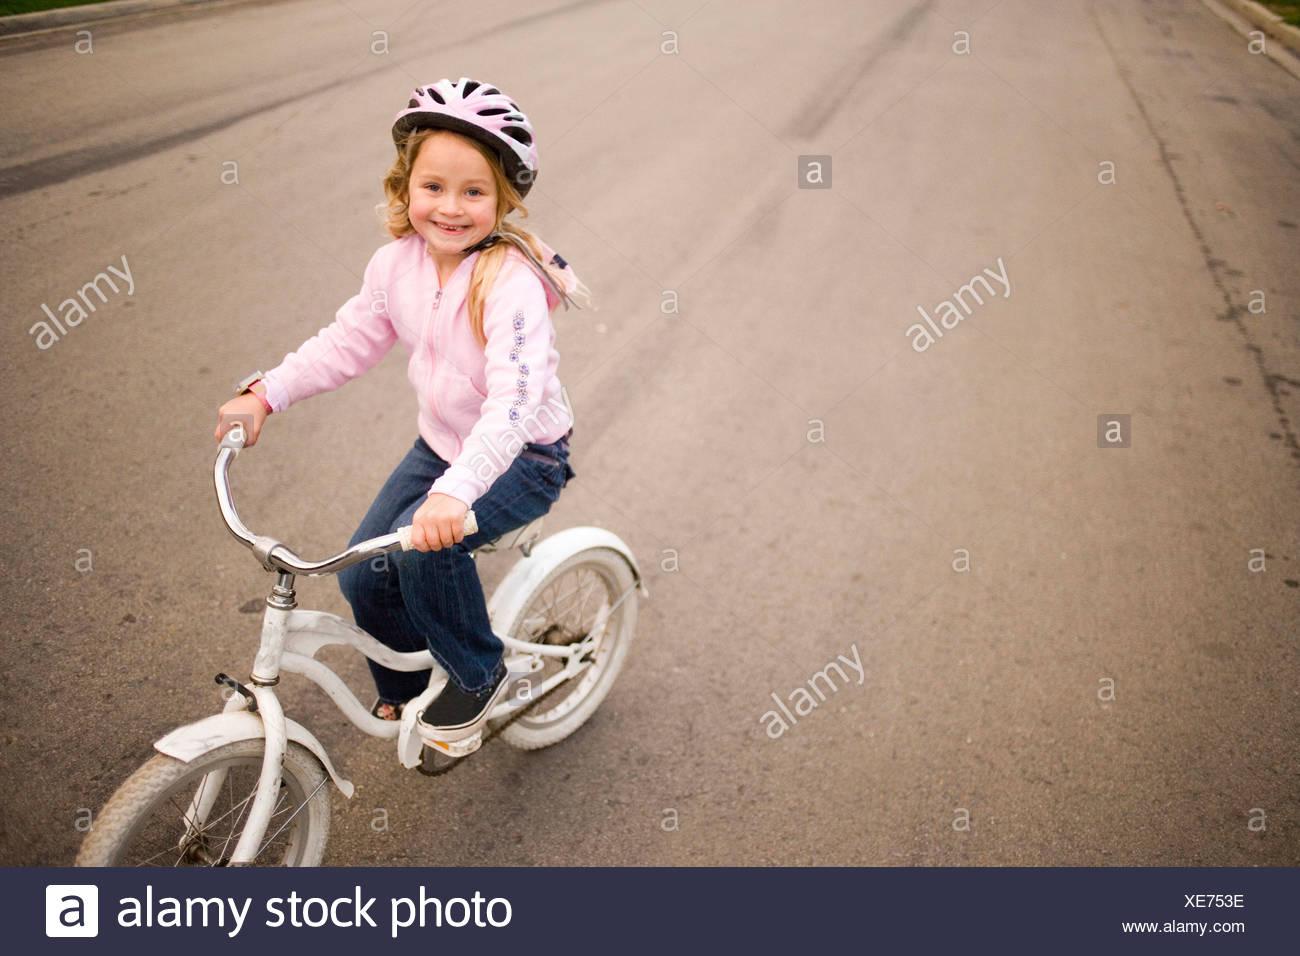 Girl riding bicycle - Stock Image